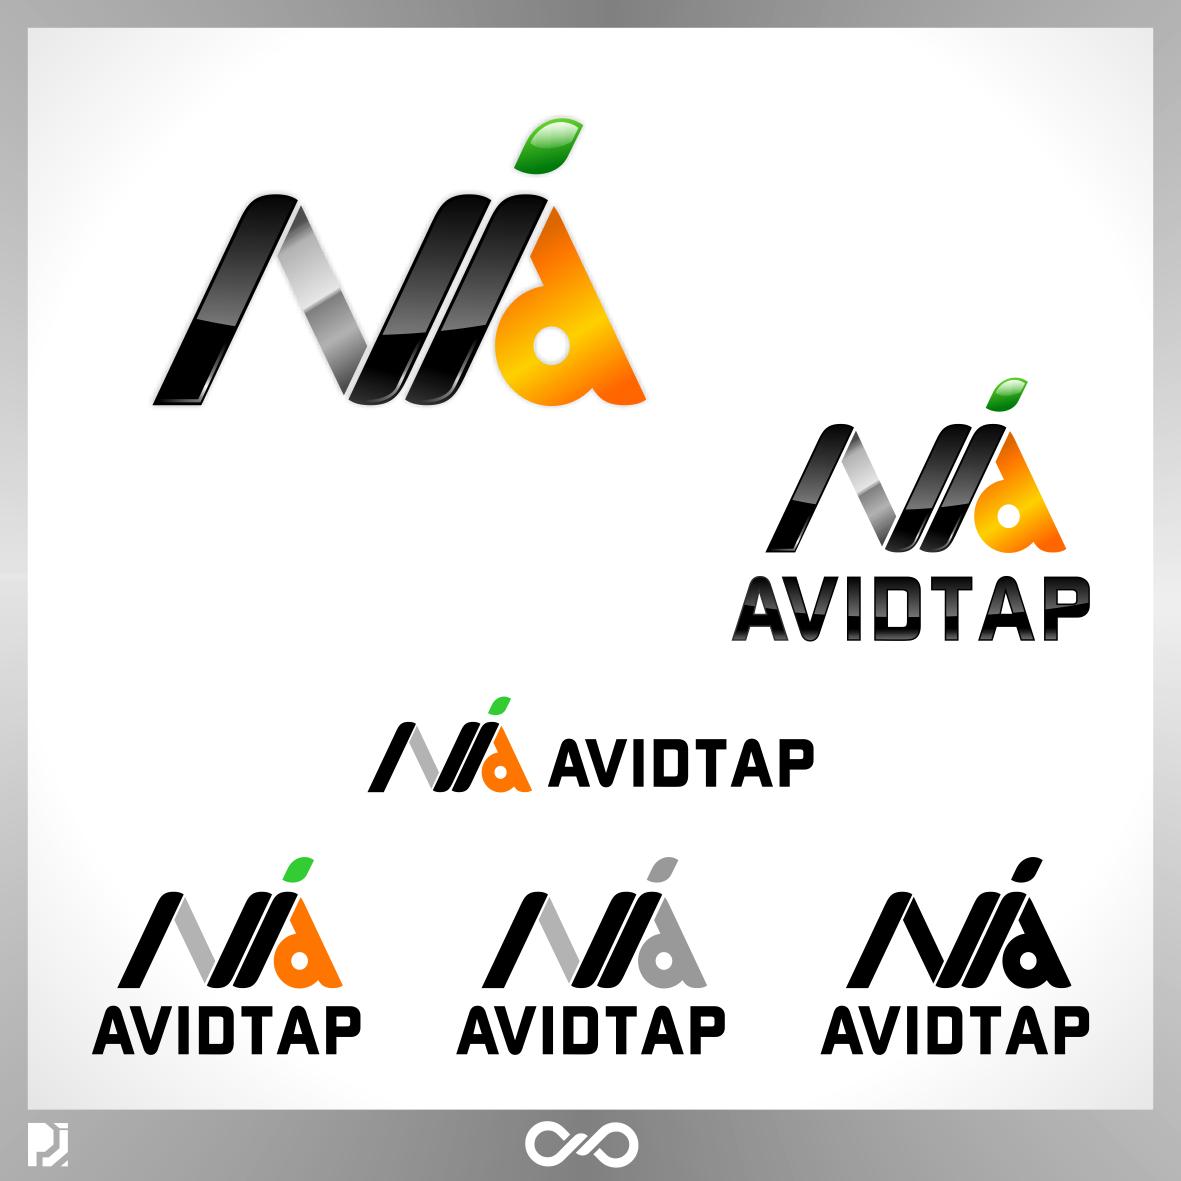 Logo Design by PJD - Entry No. 106 in the Logo Design Contest Imaginative Logo Design for AvidTap.